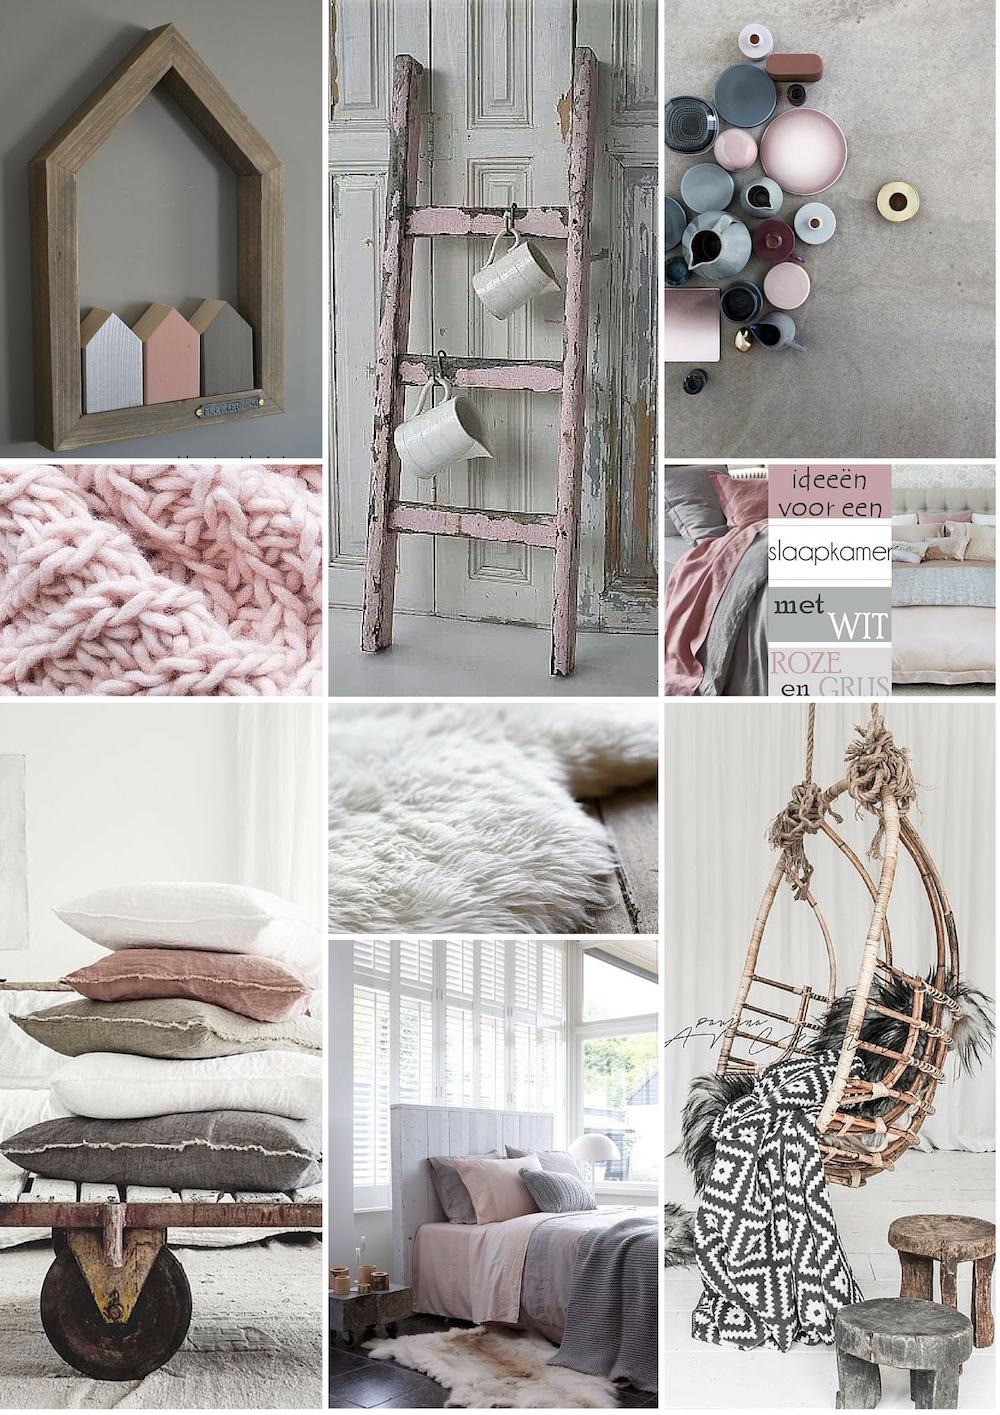 Hippe meiden slaapkamer for - Volwassen slaapkamer idee ...